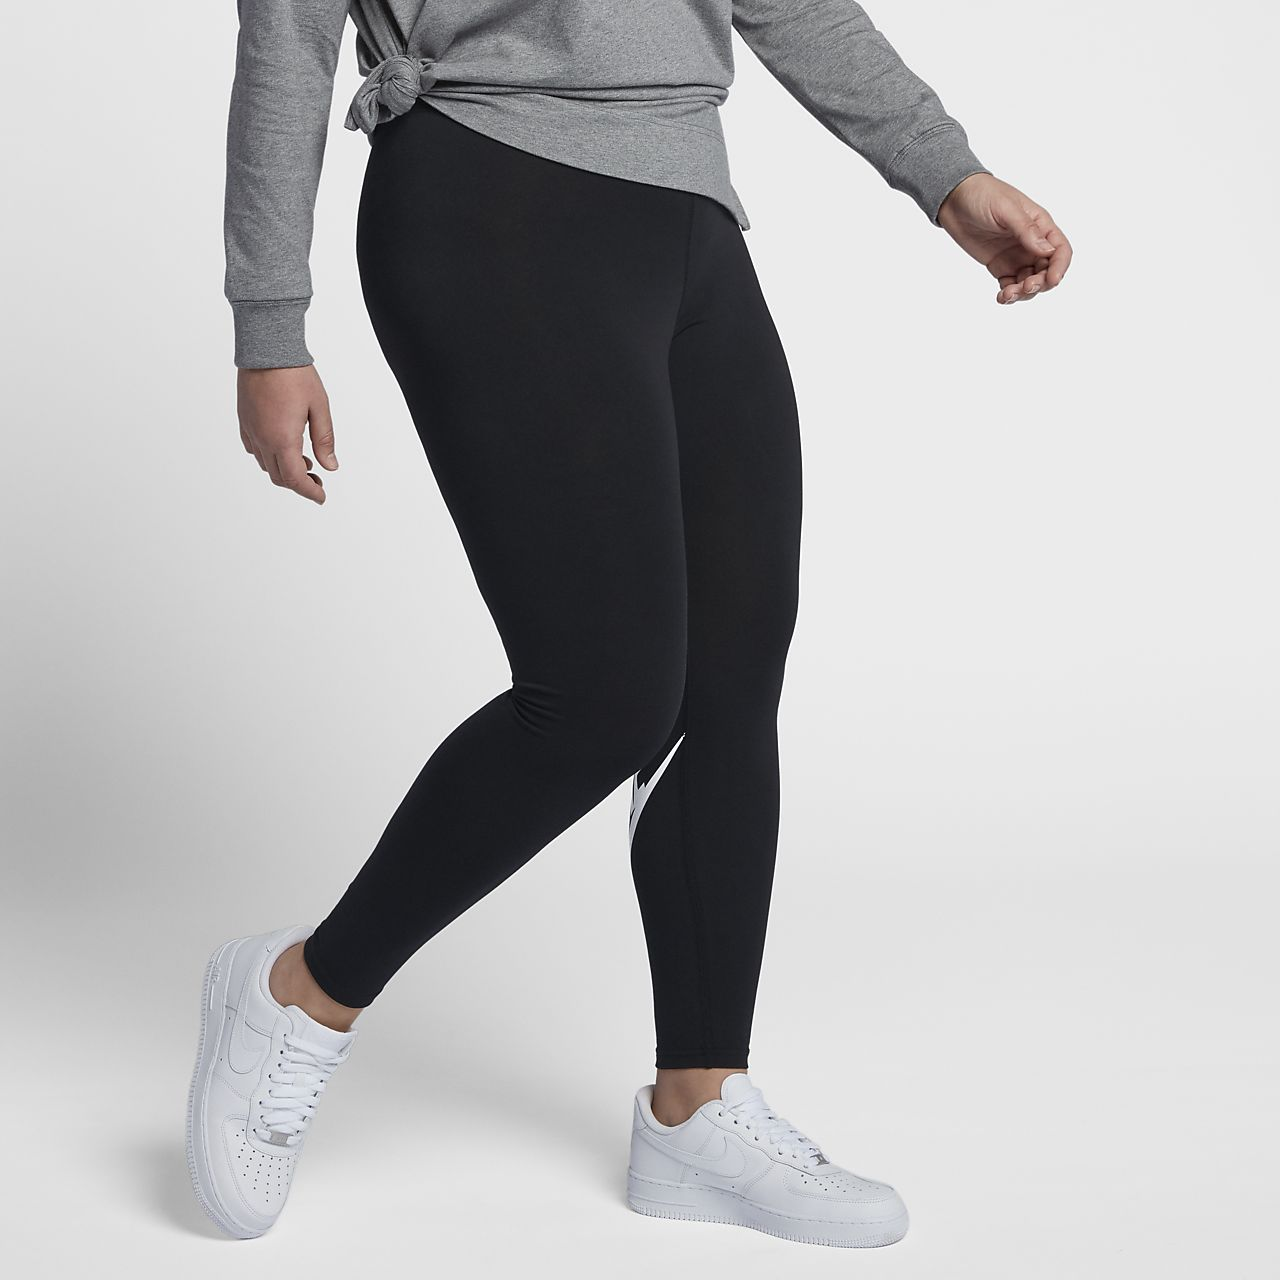 See Nike Grande talla Leg A Leggings Para Mujer Sportswear TqRw7F6